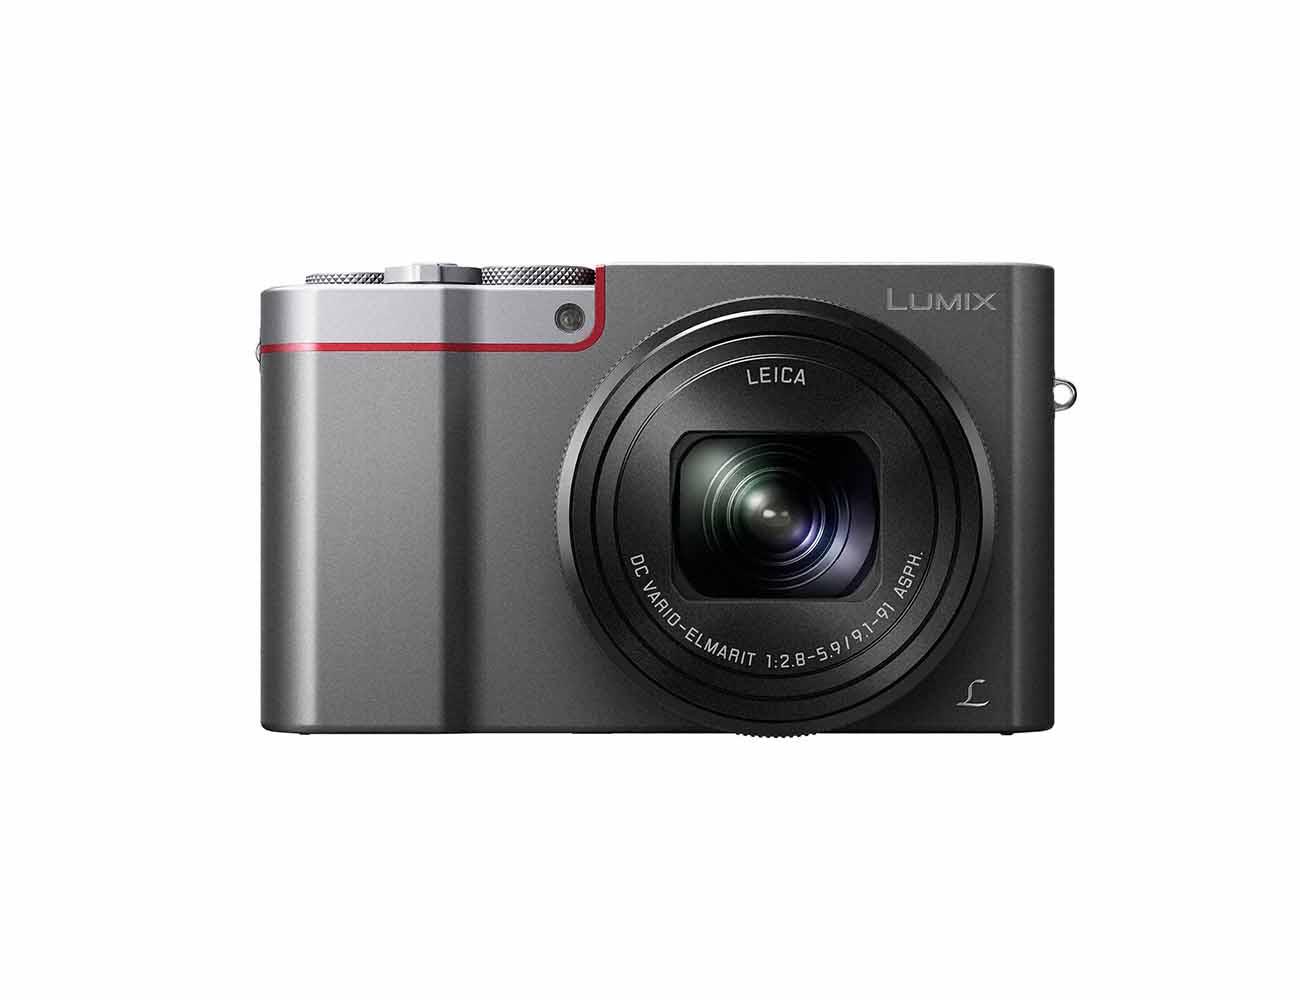 Lumix ZS100 – 4K Digital Camera With 20 MP Sensor from Panasonic